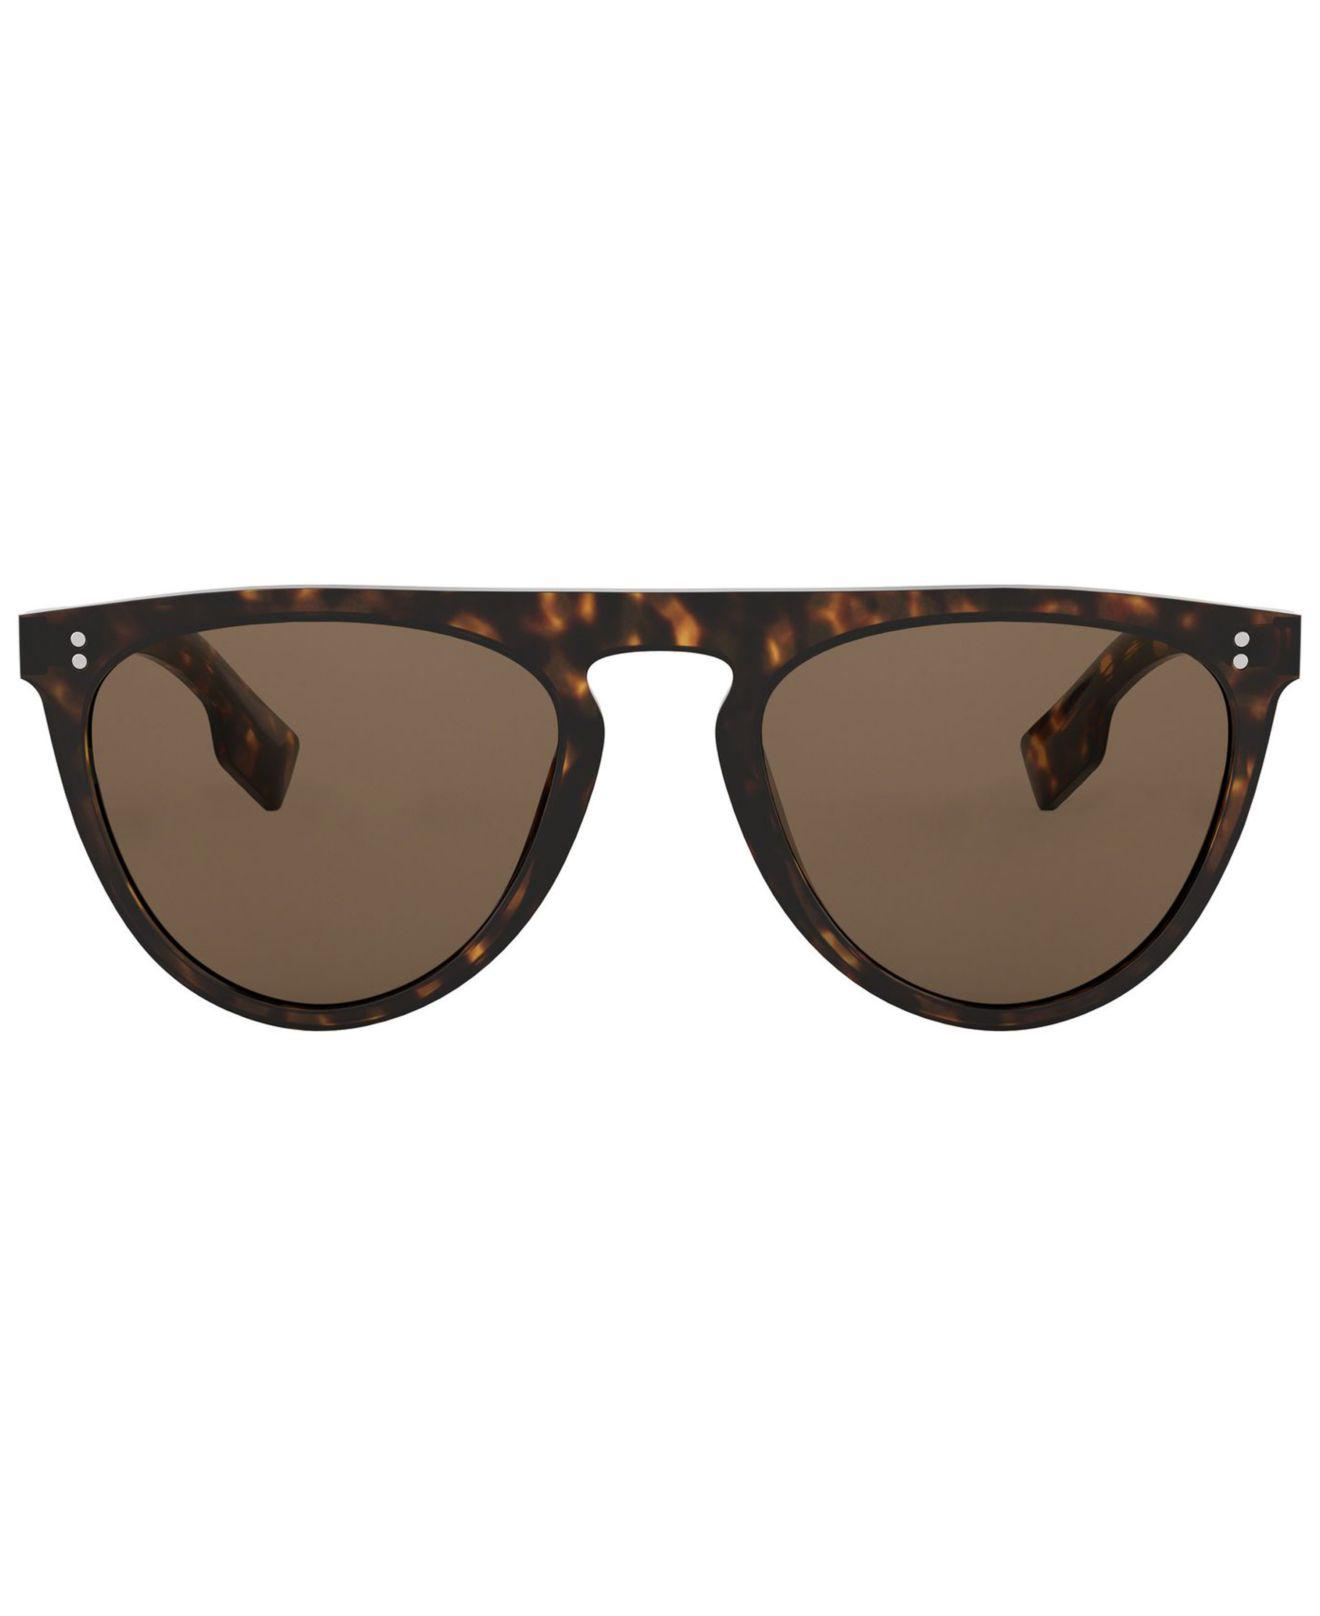 1999df2425b Lyst - Burberry Sunglasses